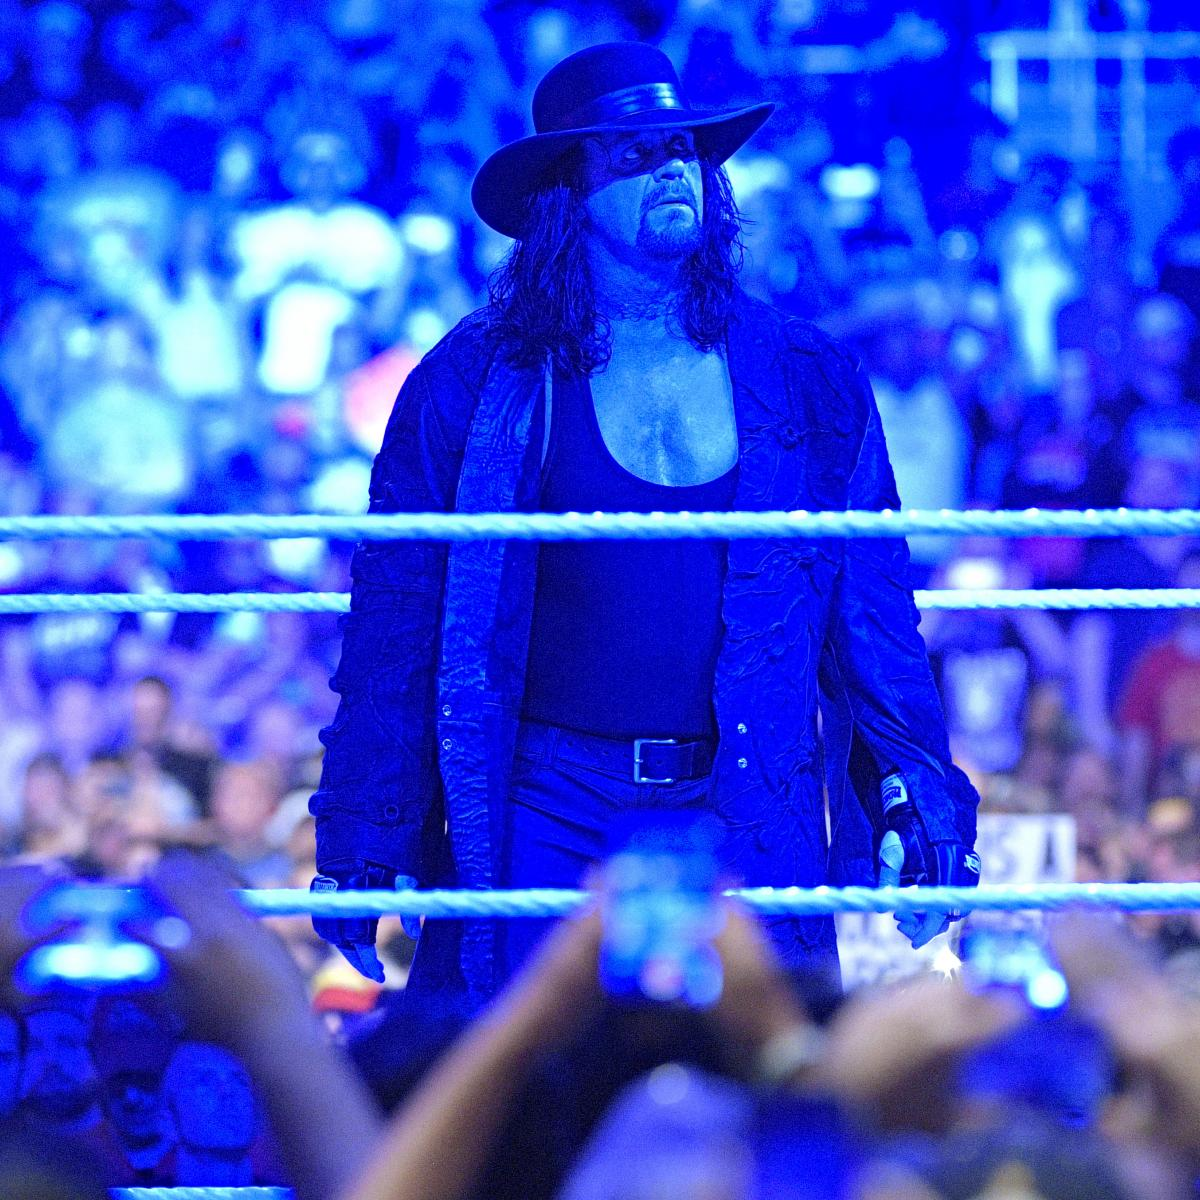 Undertaker Super ShowDown Rumor, Edge Return Date, Rusev's WWE Status